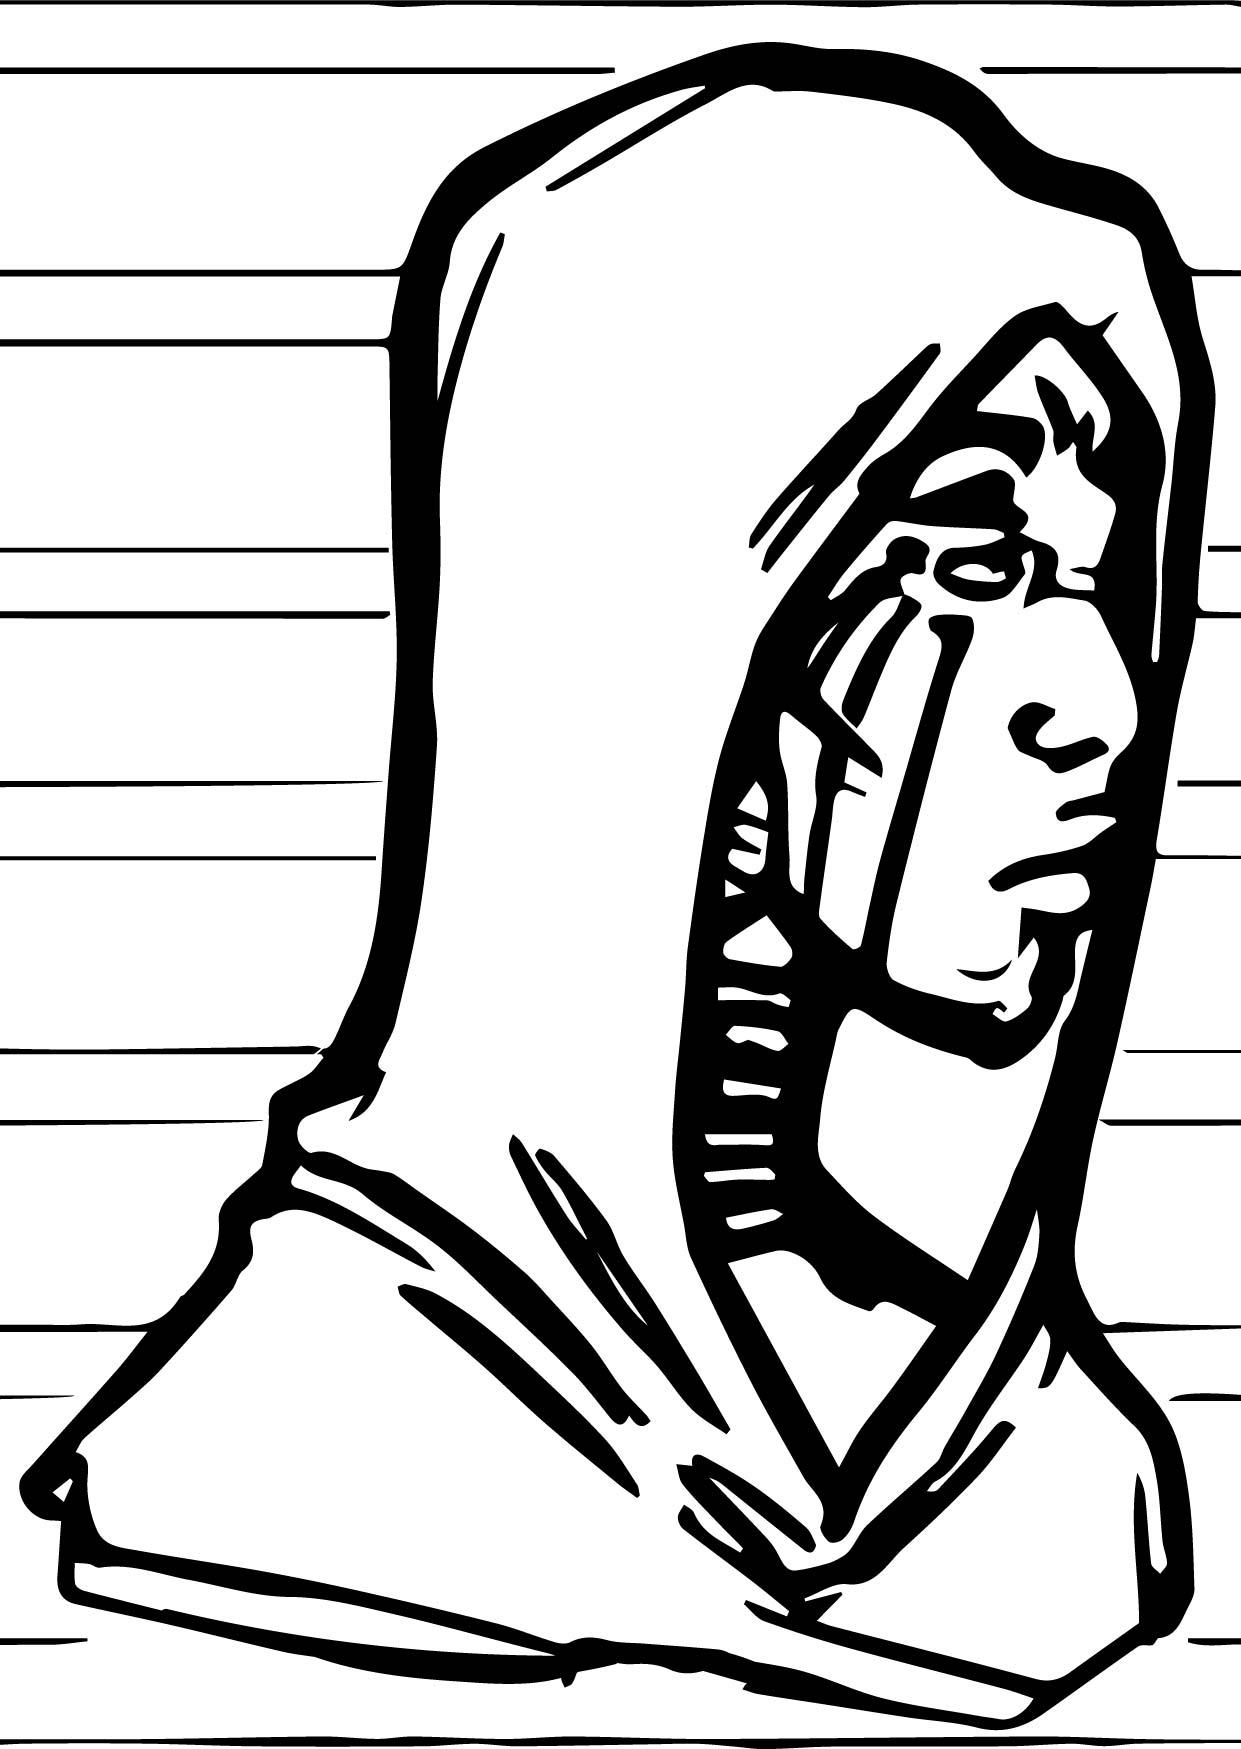 Man Human Zecora Coloring Page